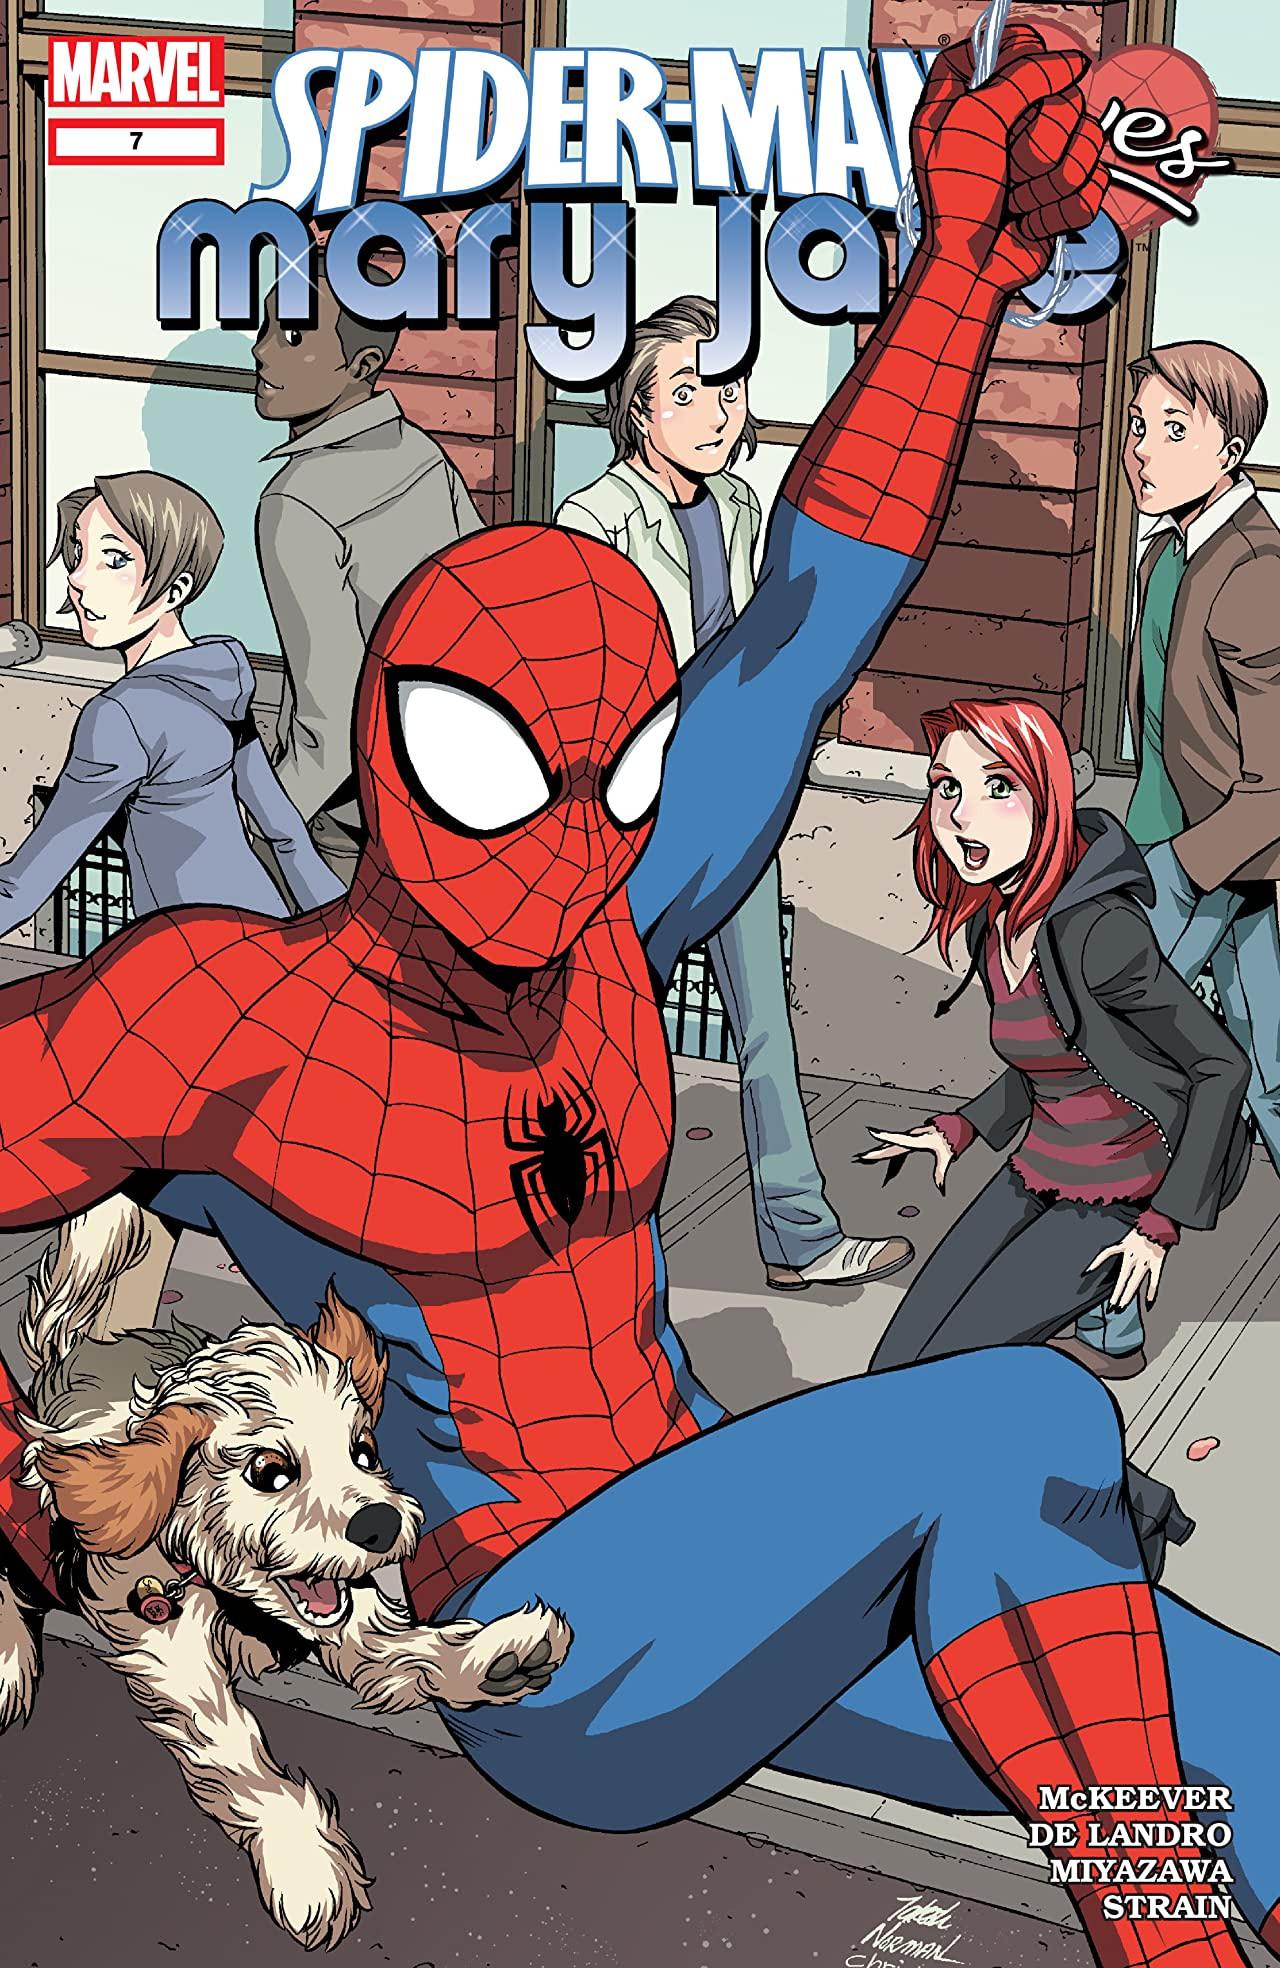 Spider-Man Loves Mary Jane Vol 1 7